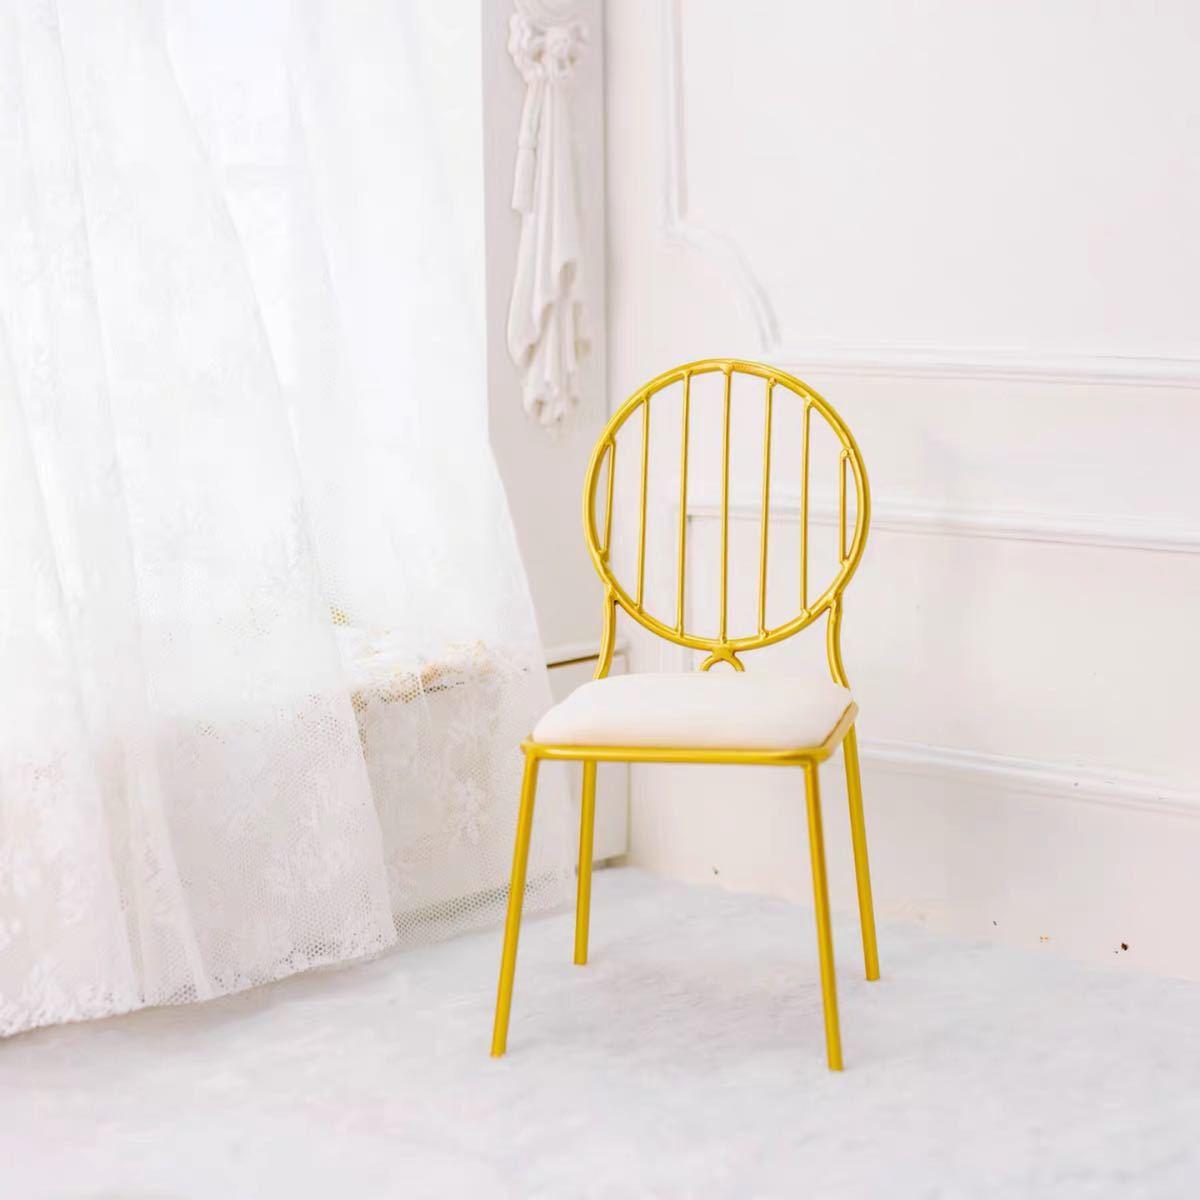 BJDドール用椅子 MSD/MDD/DD/SDサイズ 生地のオーダー可能 球体関節人形 doll 家具_画像1